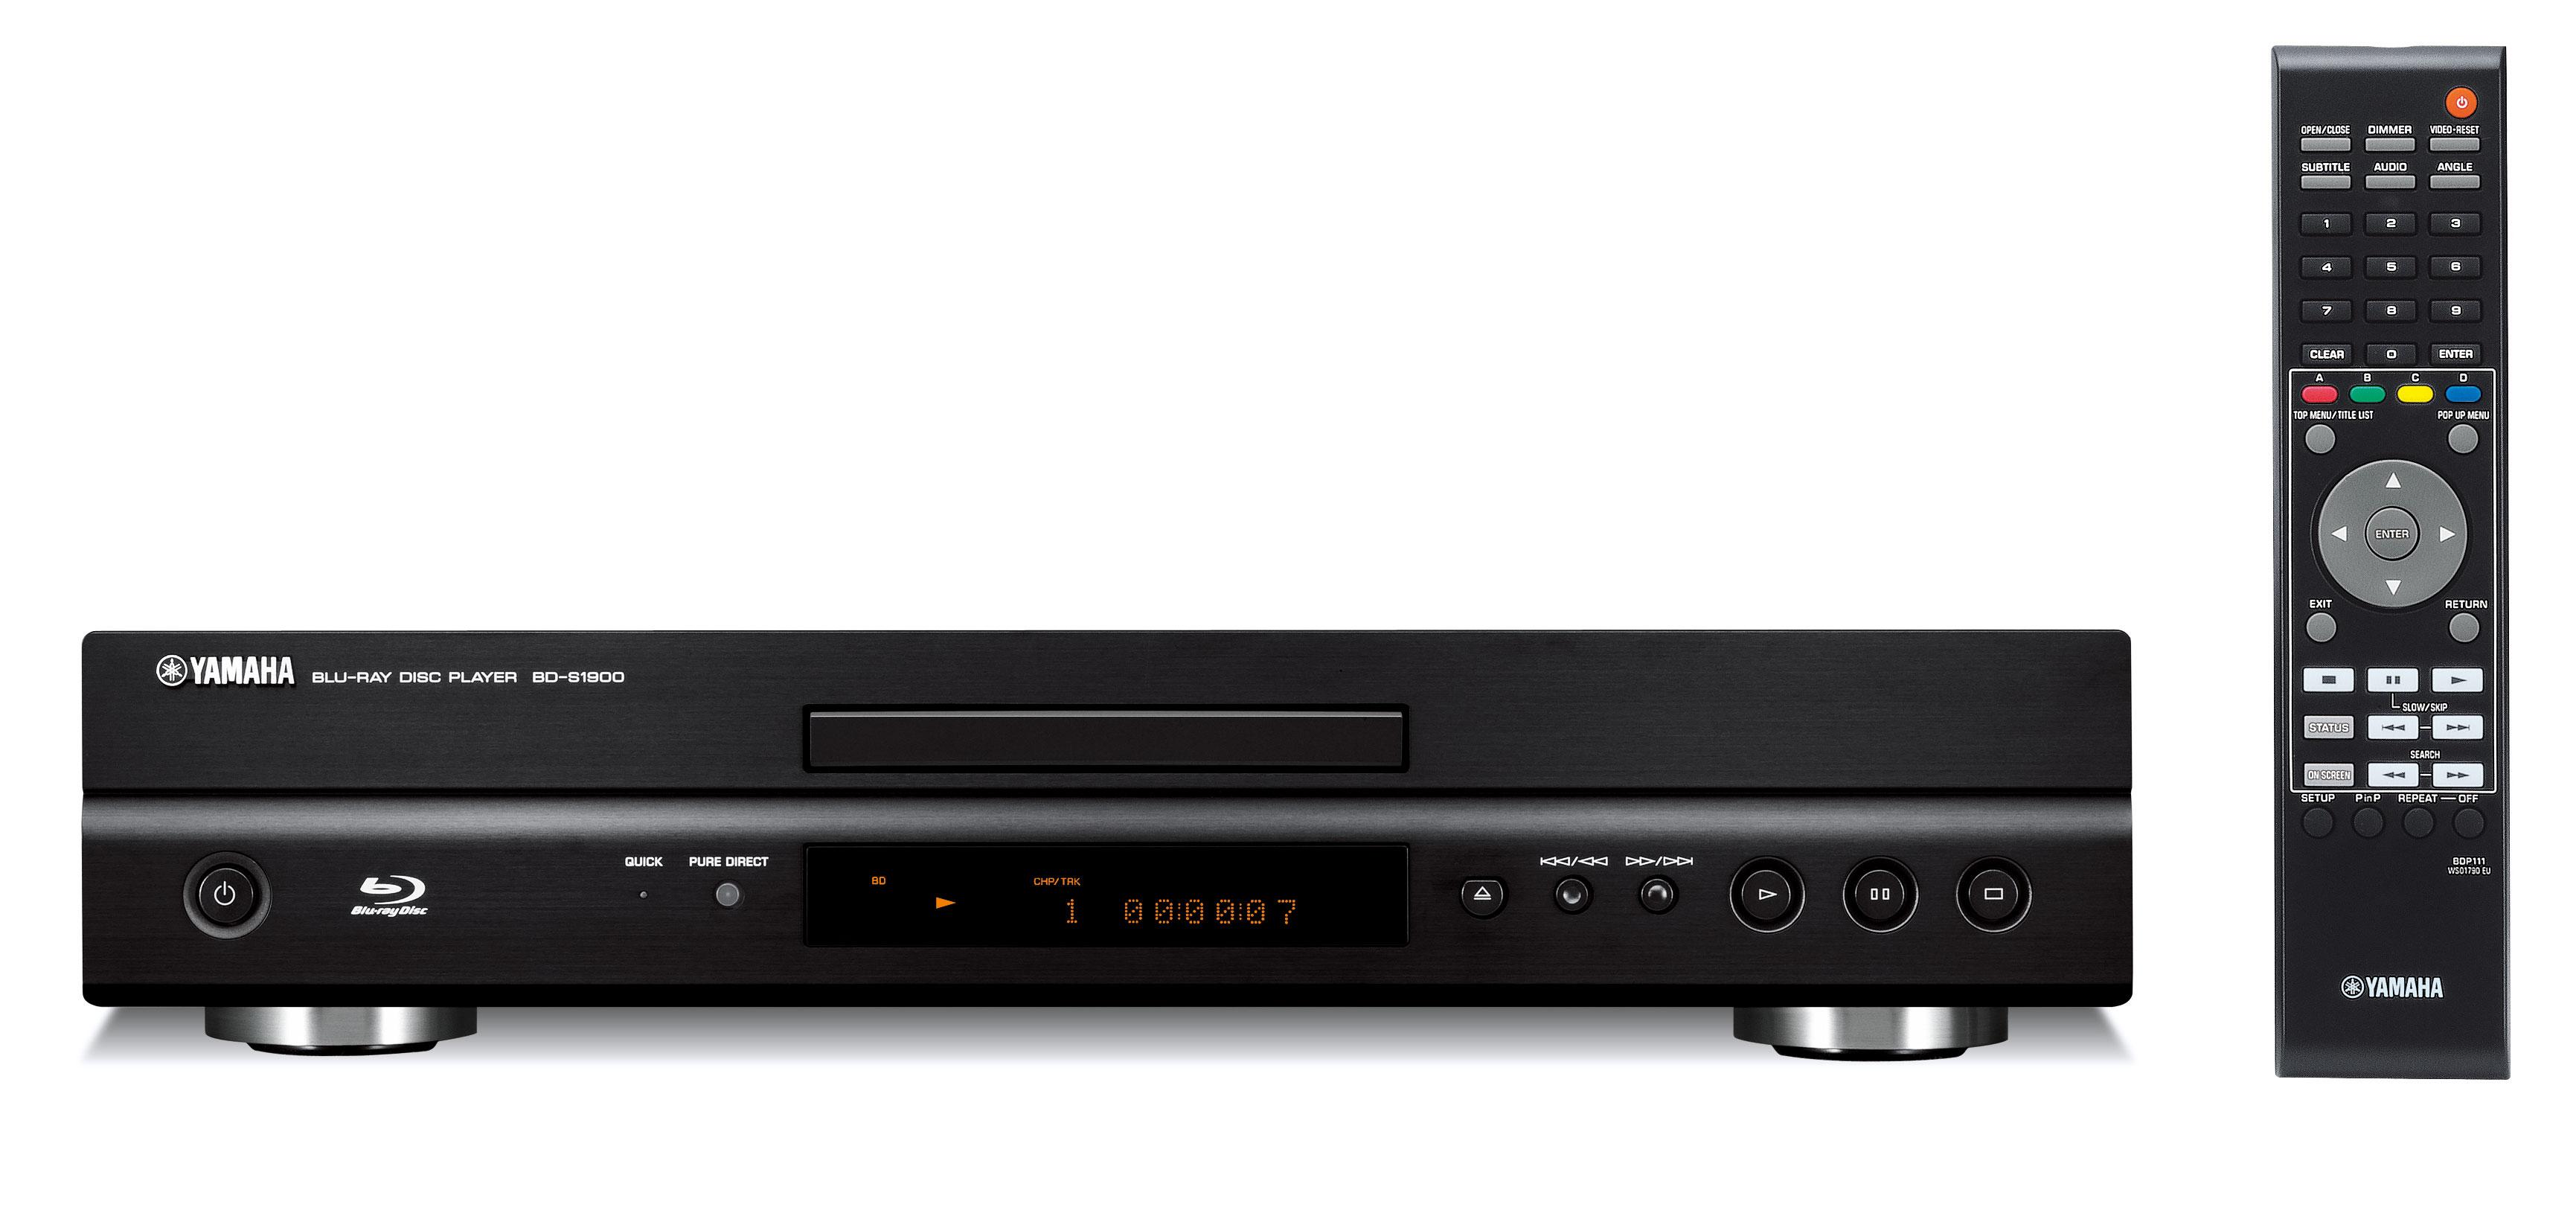 Yamaha bd s1900 for Fujifilm s8100fd prix